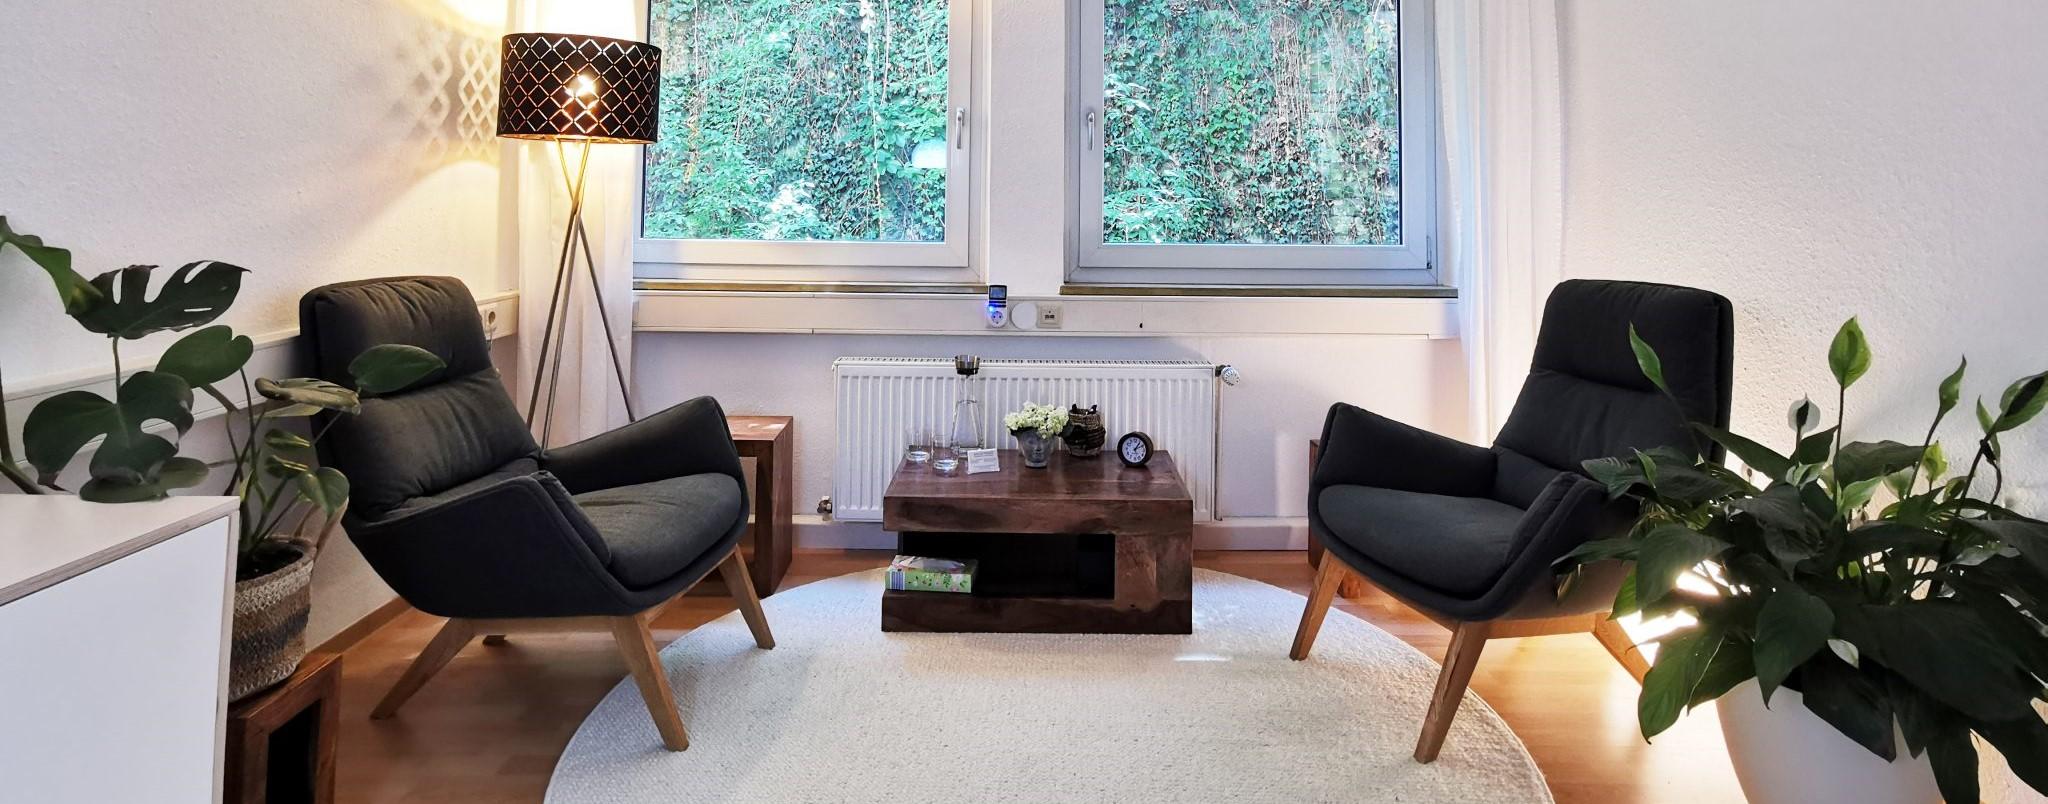 Psychotherapie Stuttgart